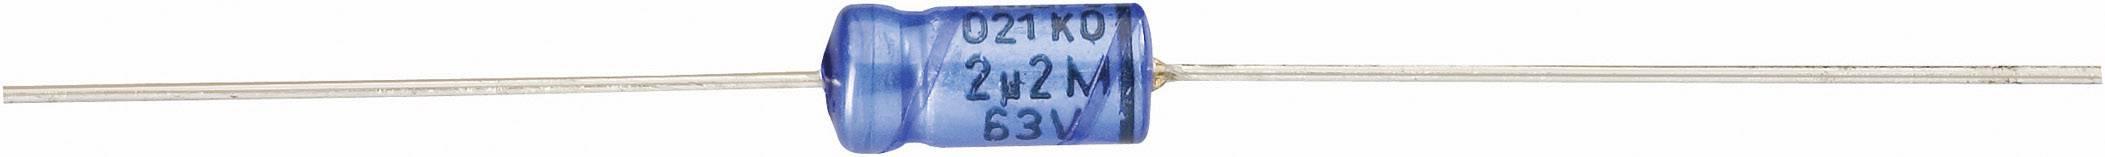 Axiální kondenzátor elektrolytický Vishay 2222 021 36221, 220 µF, 25 V, 20 %, 18 x 6,5 mm